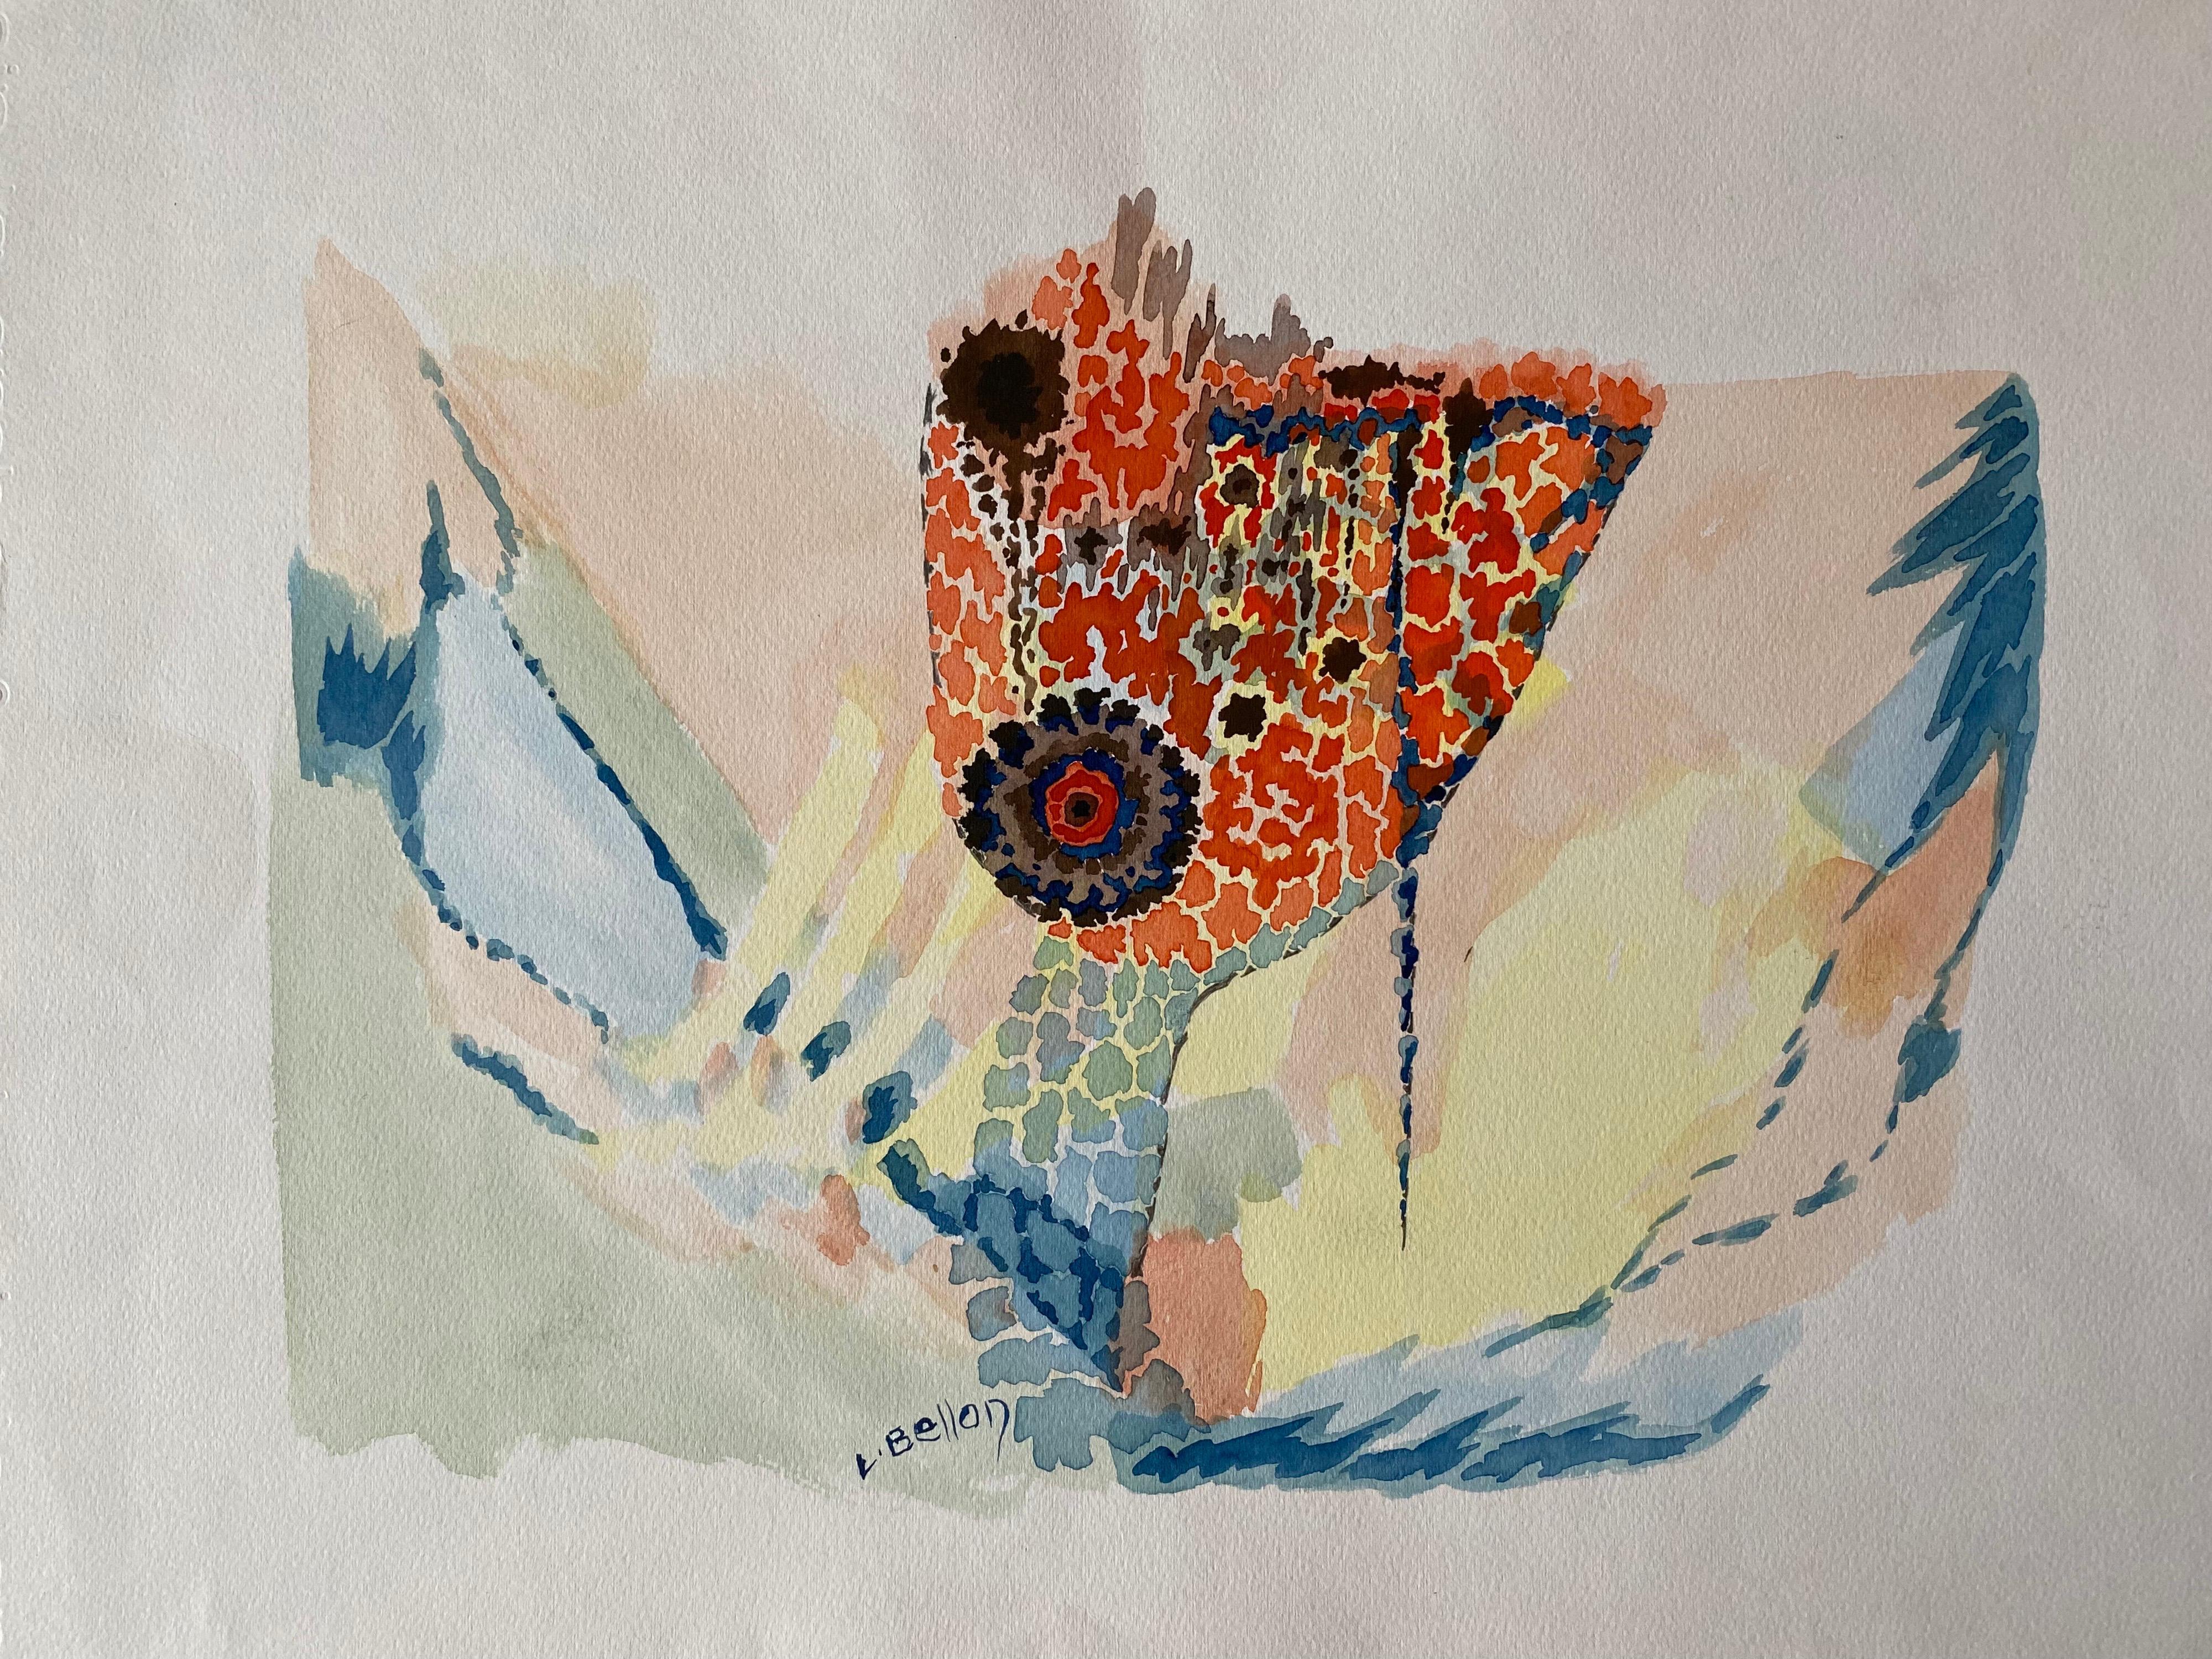 1940's Post Impressionist artist Abstract Design Artwork